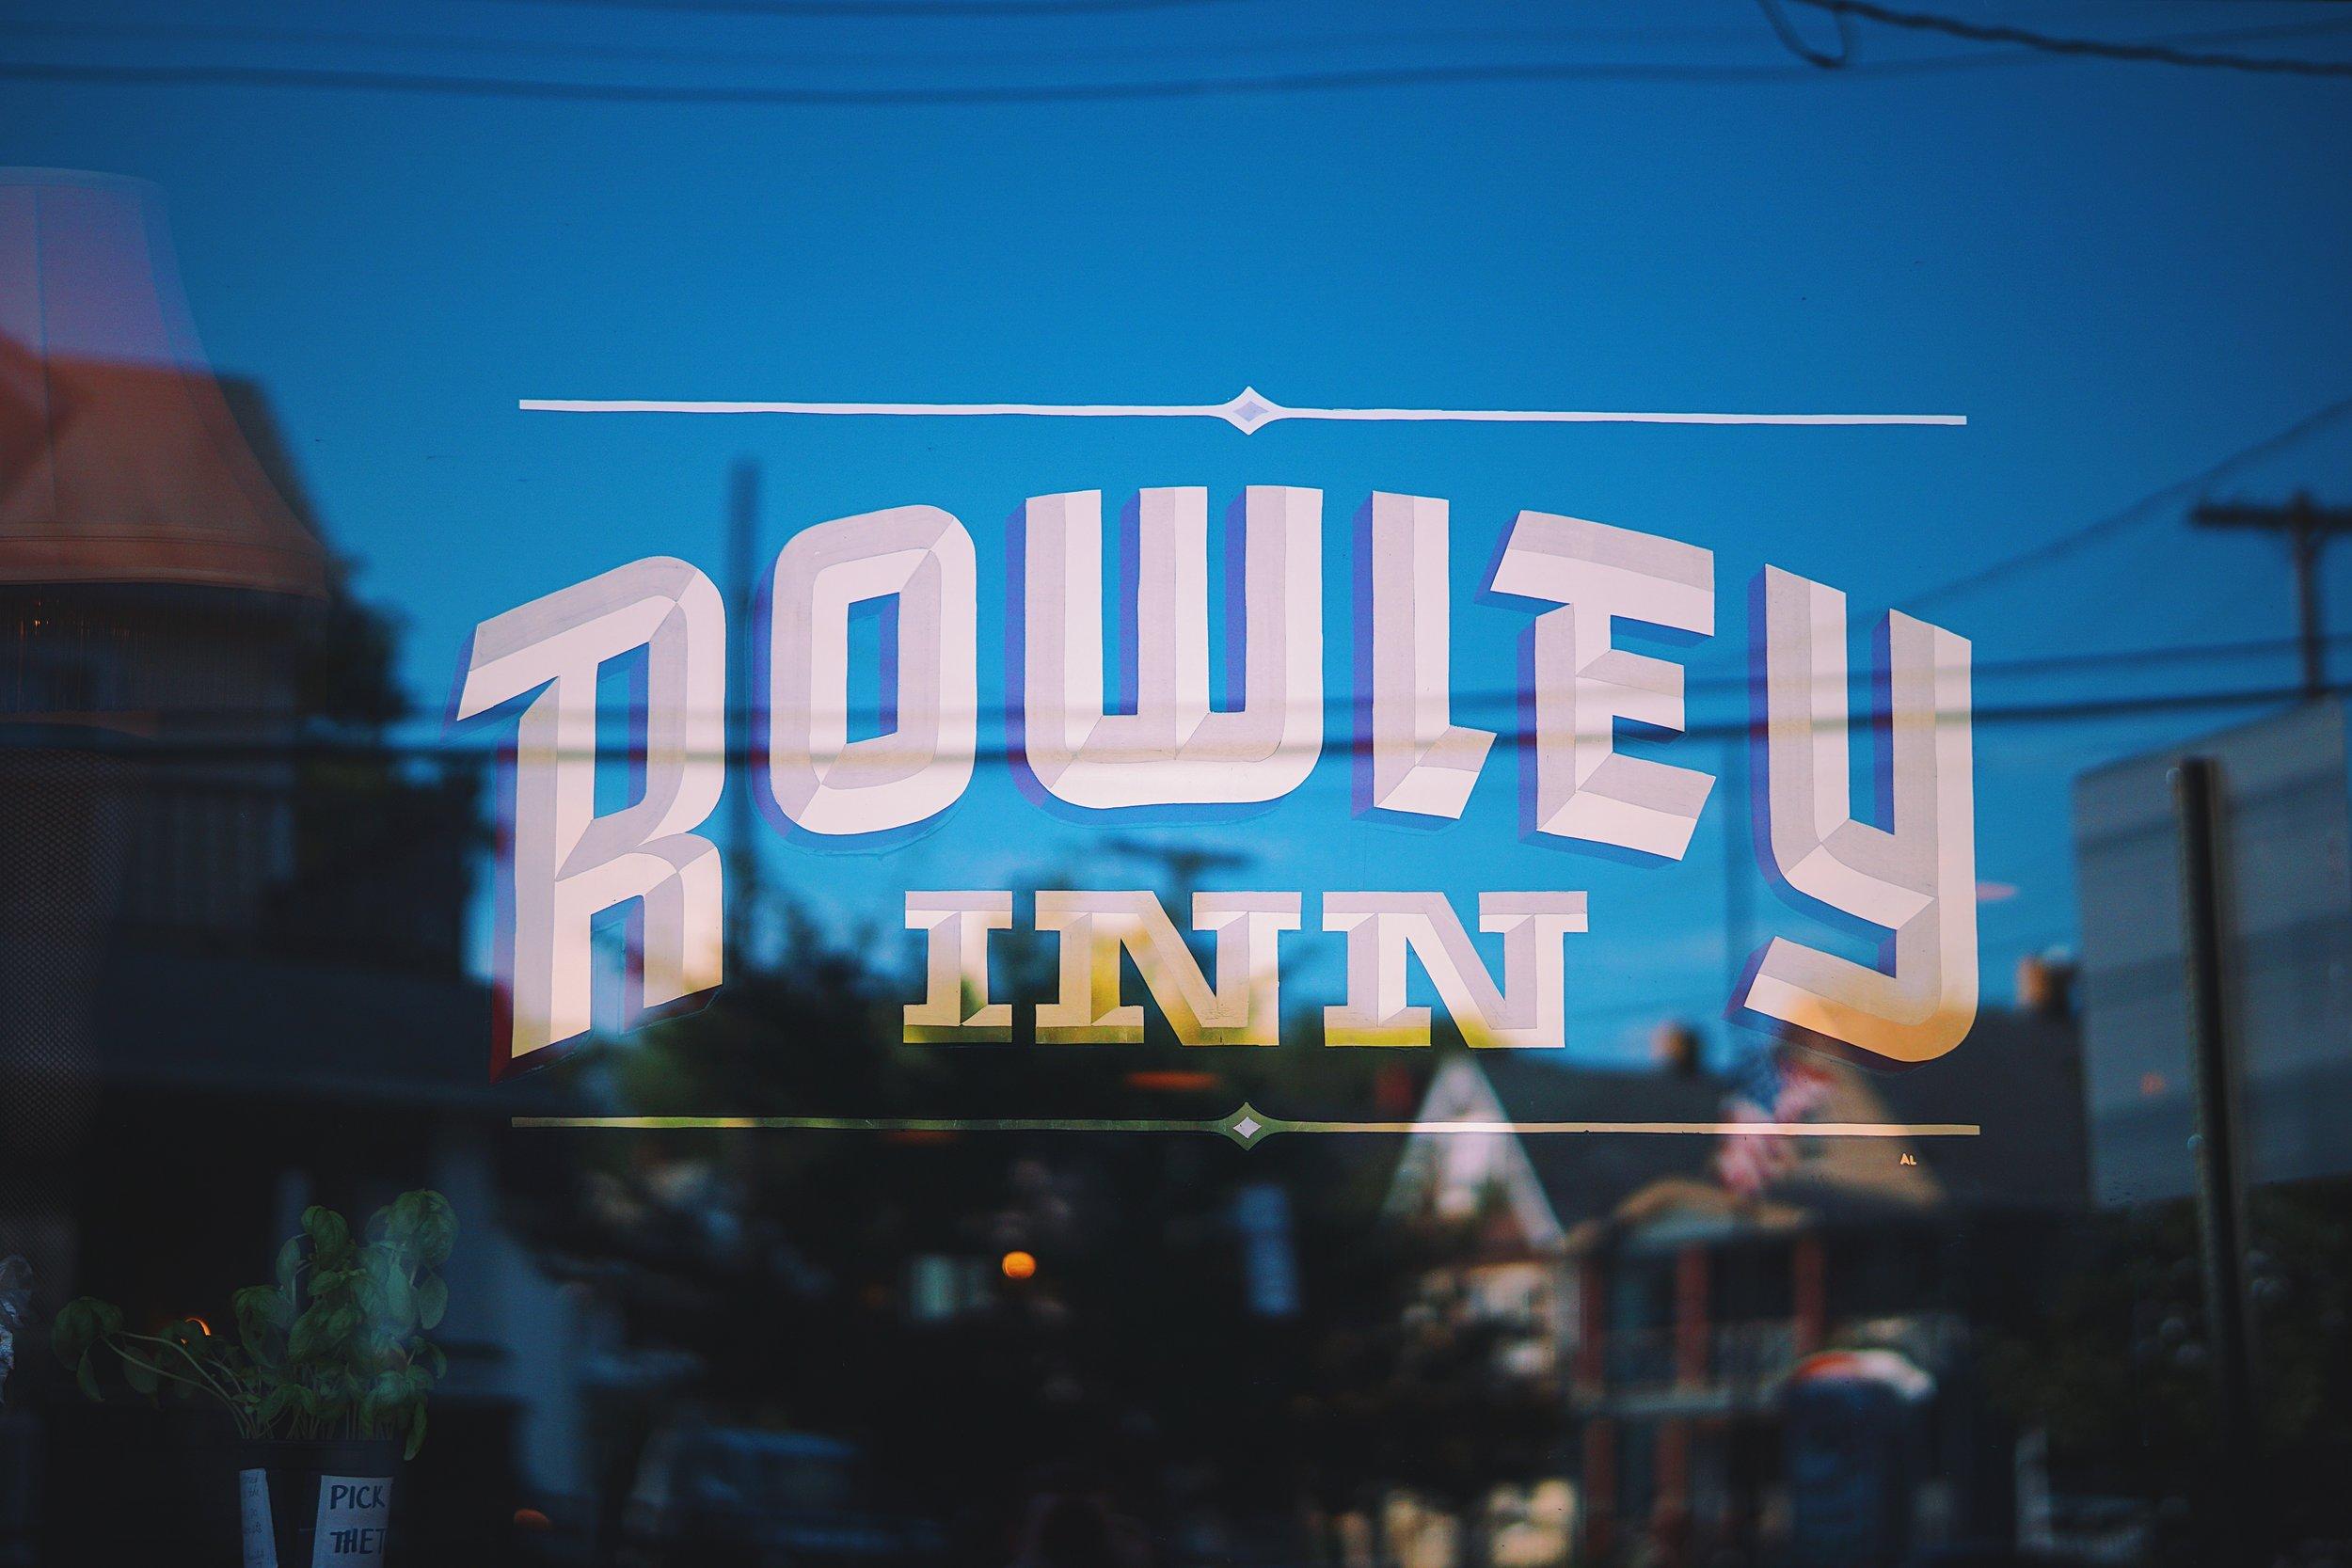 Rowley Inn Cleveland Ohio